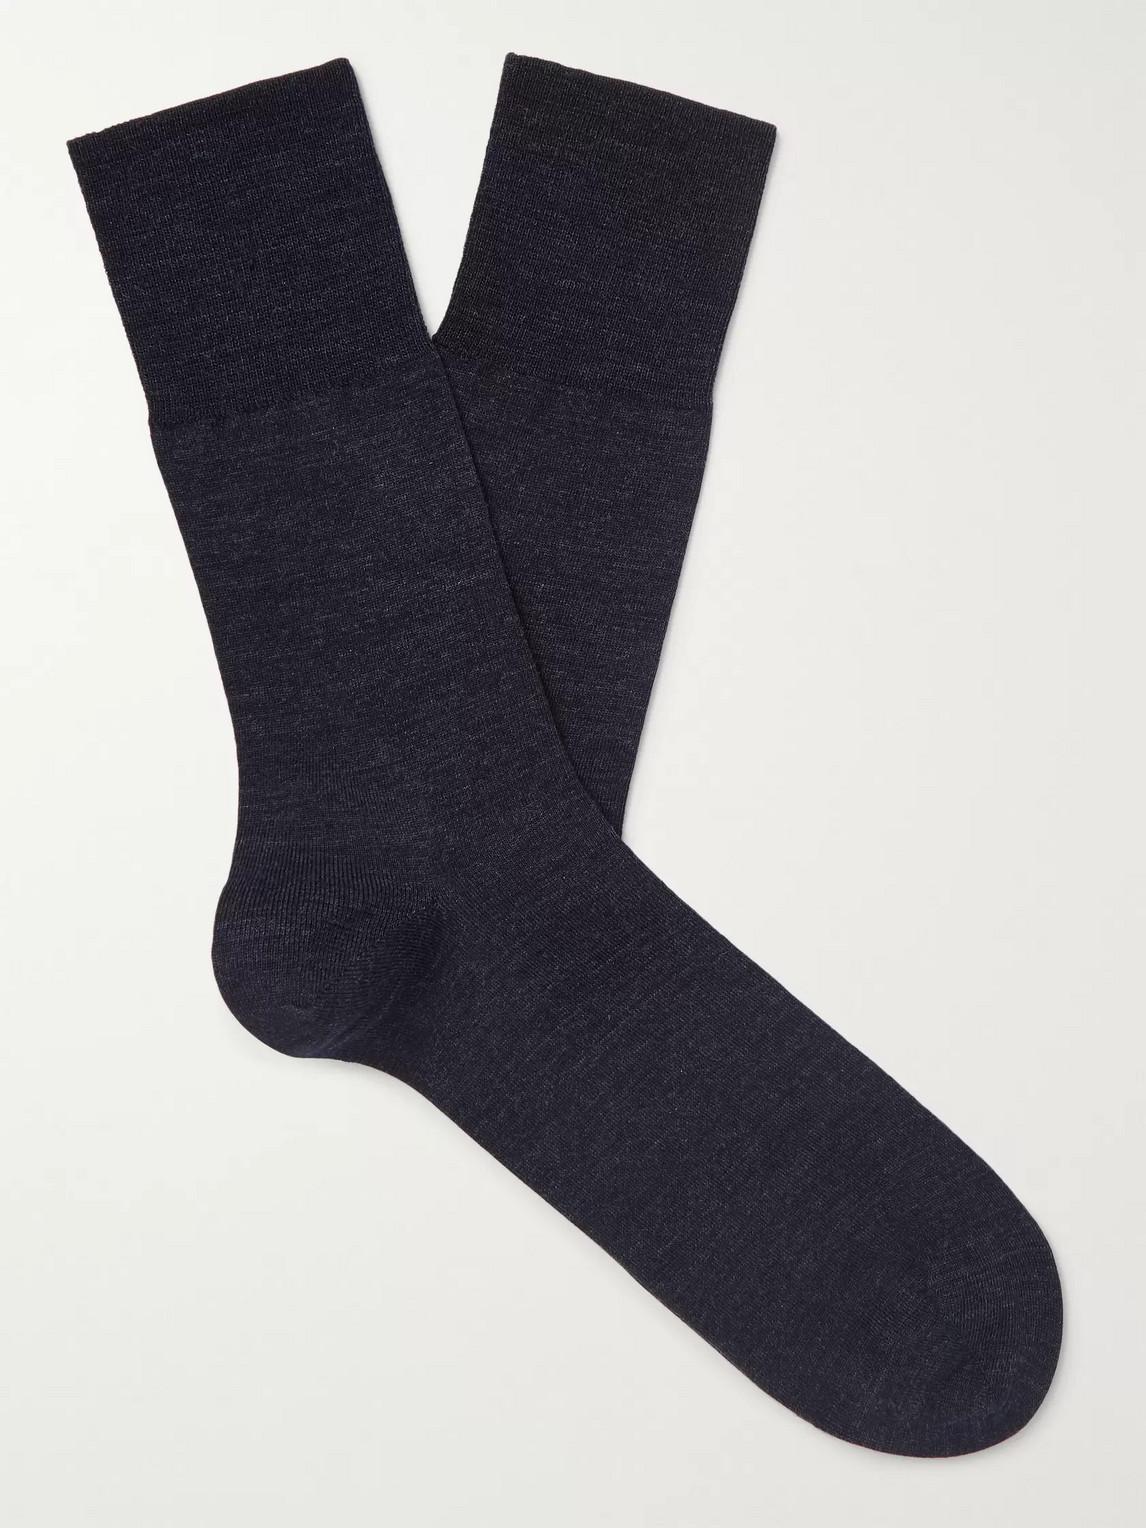 falke - airport city virgin wool-blend socks - men - gray